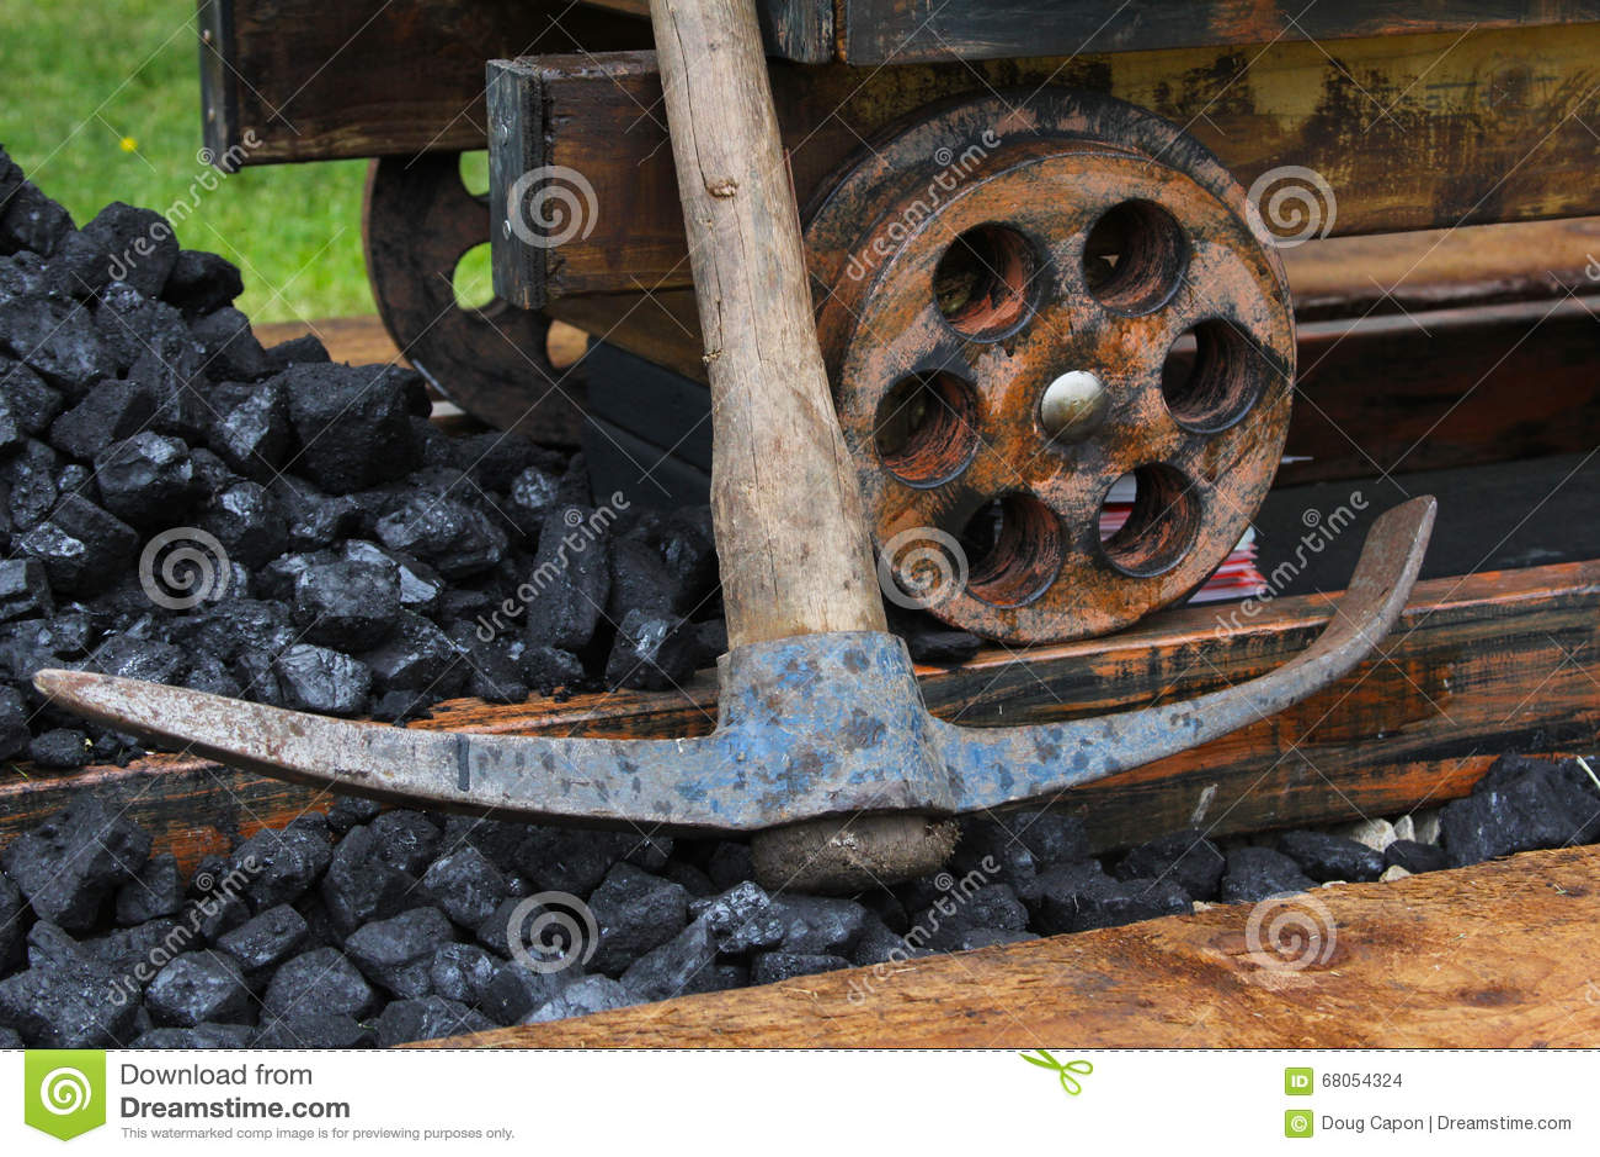 Industrial mine cart scene stock photo image